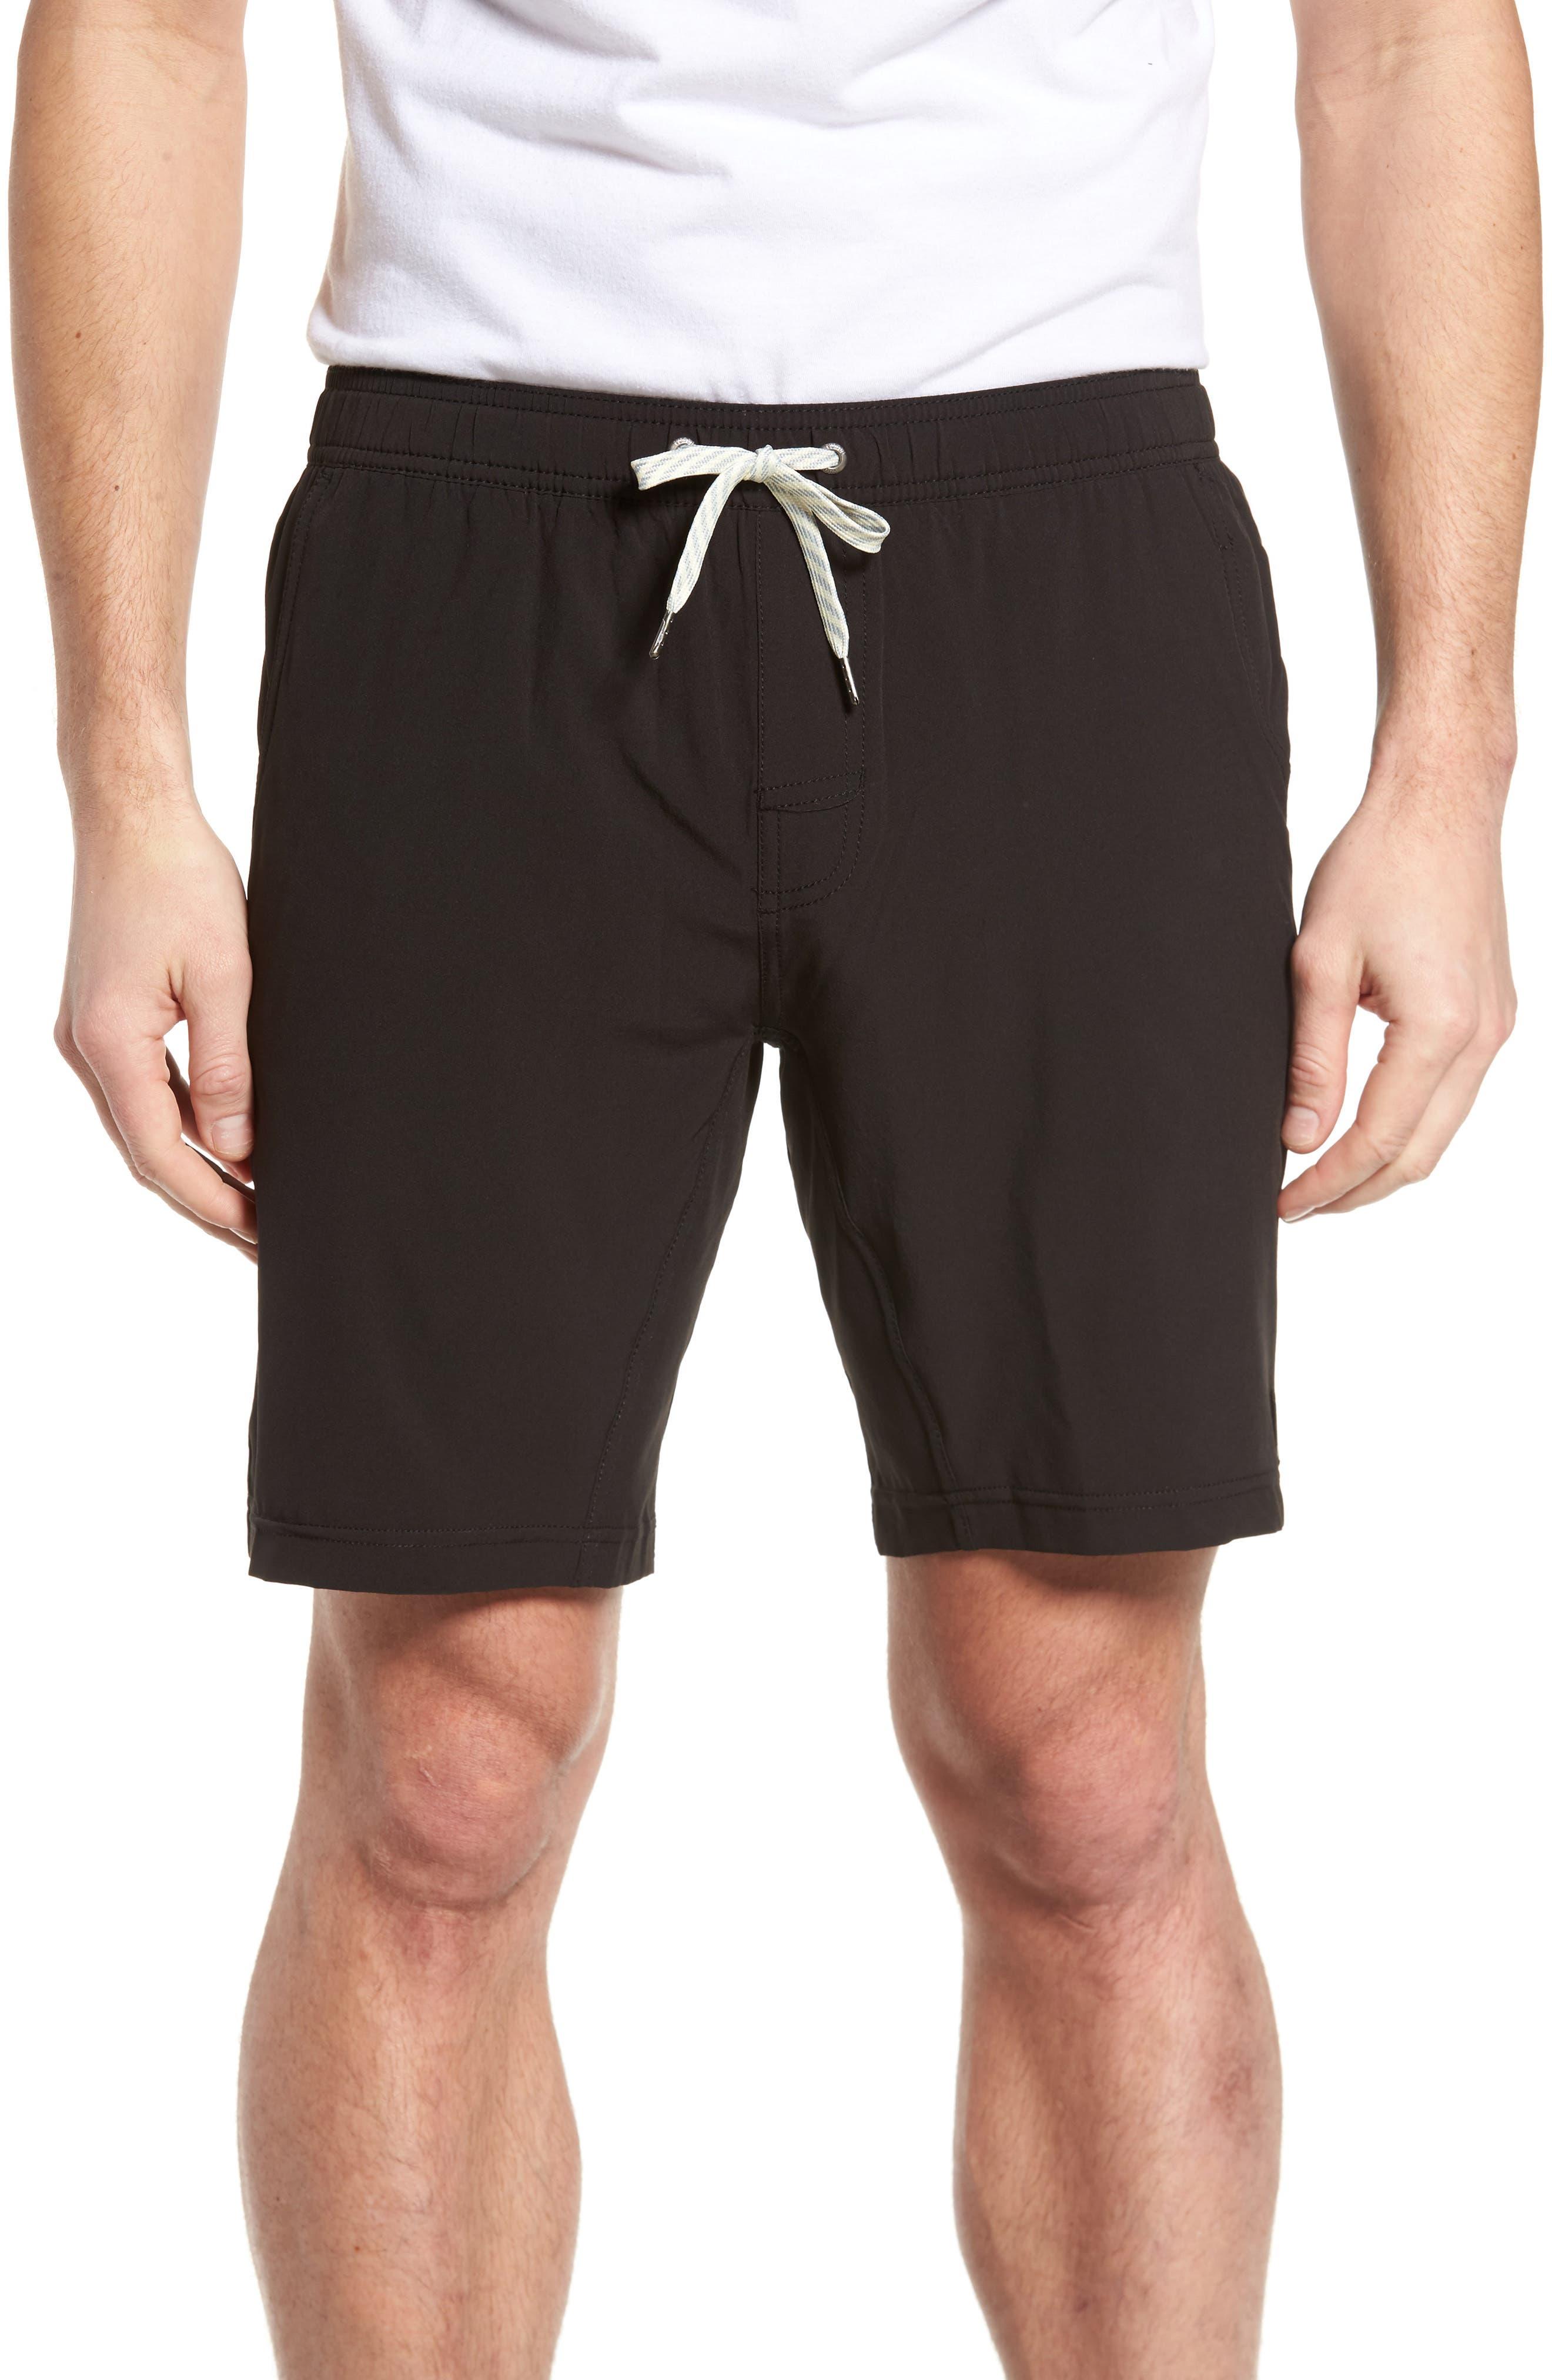 Kore Shorts,                         Main,                         color, BLACK